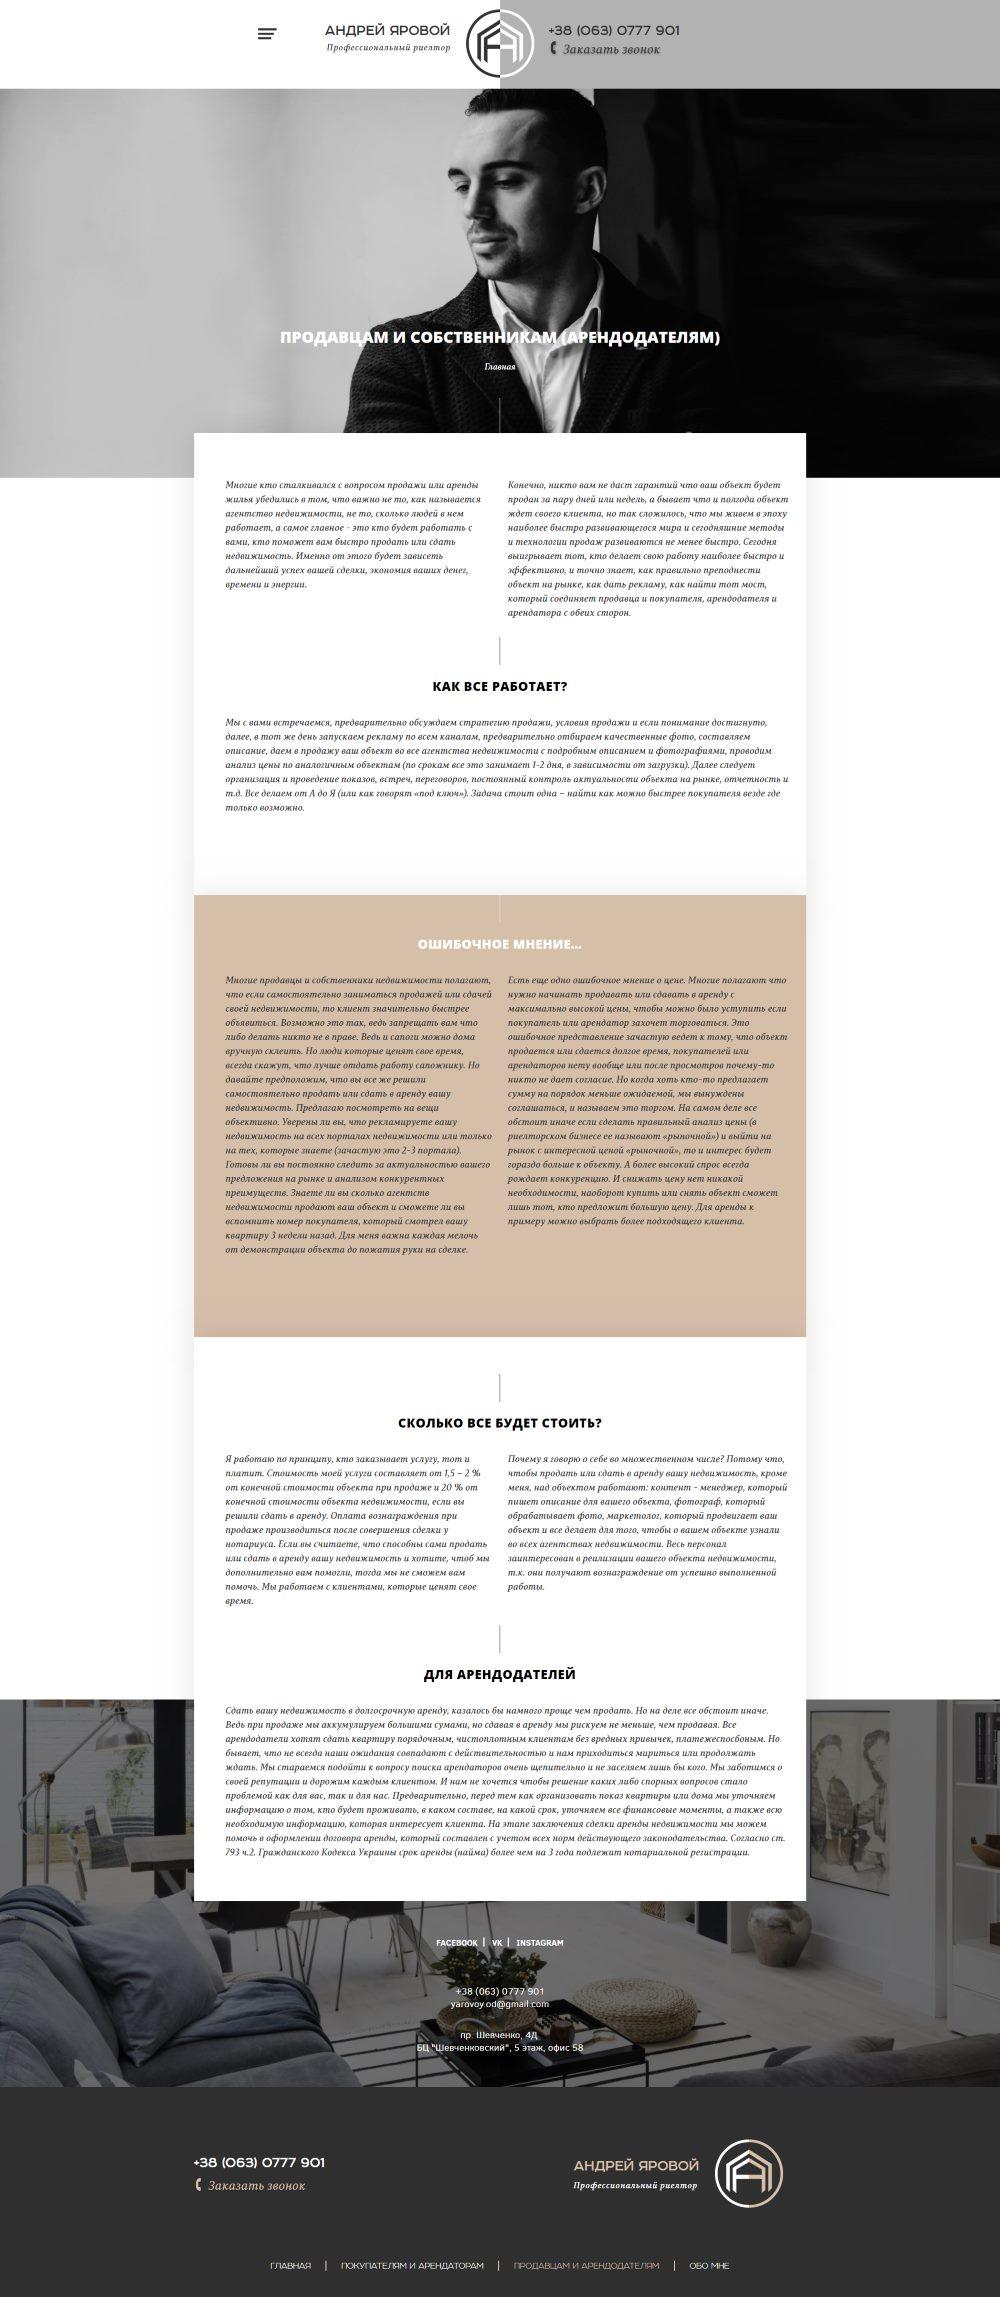 Страница «Продавцам и арендодателям»